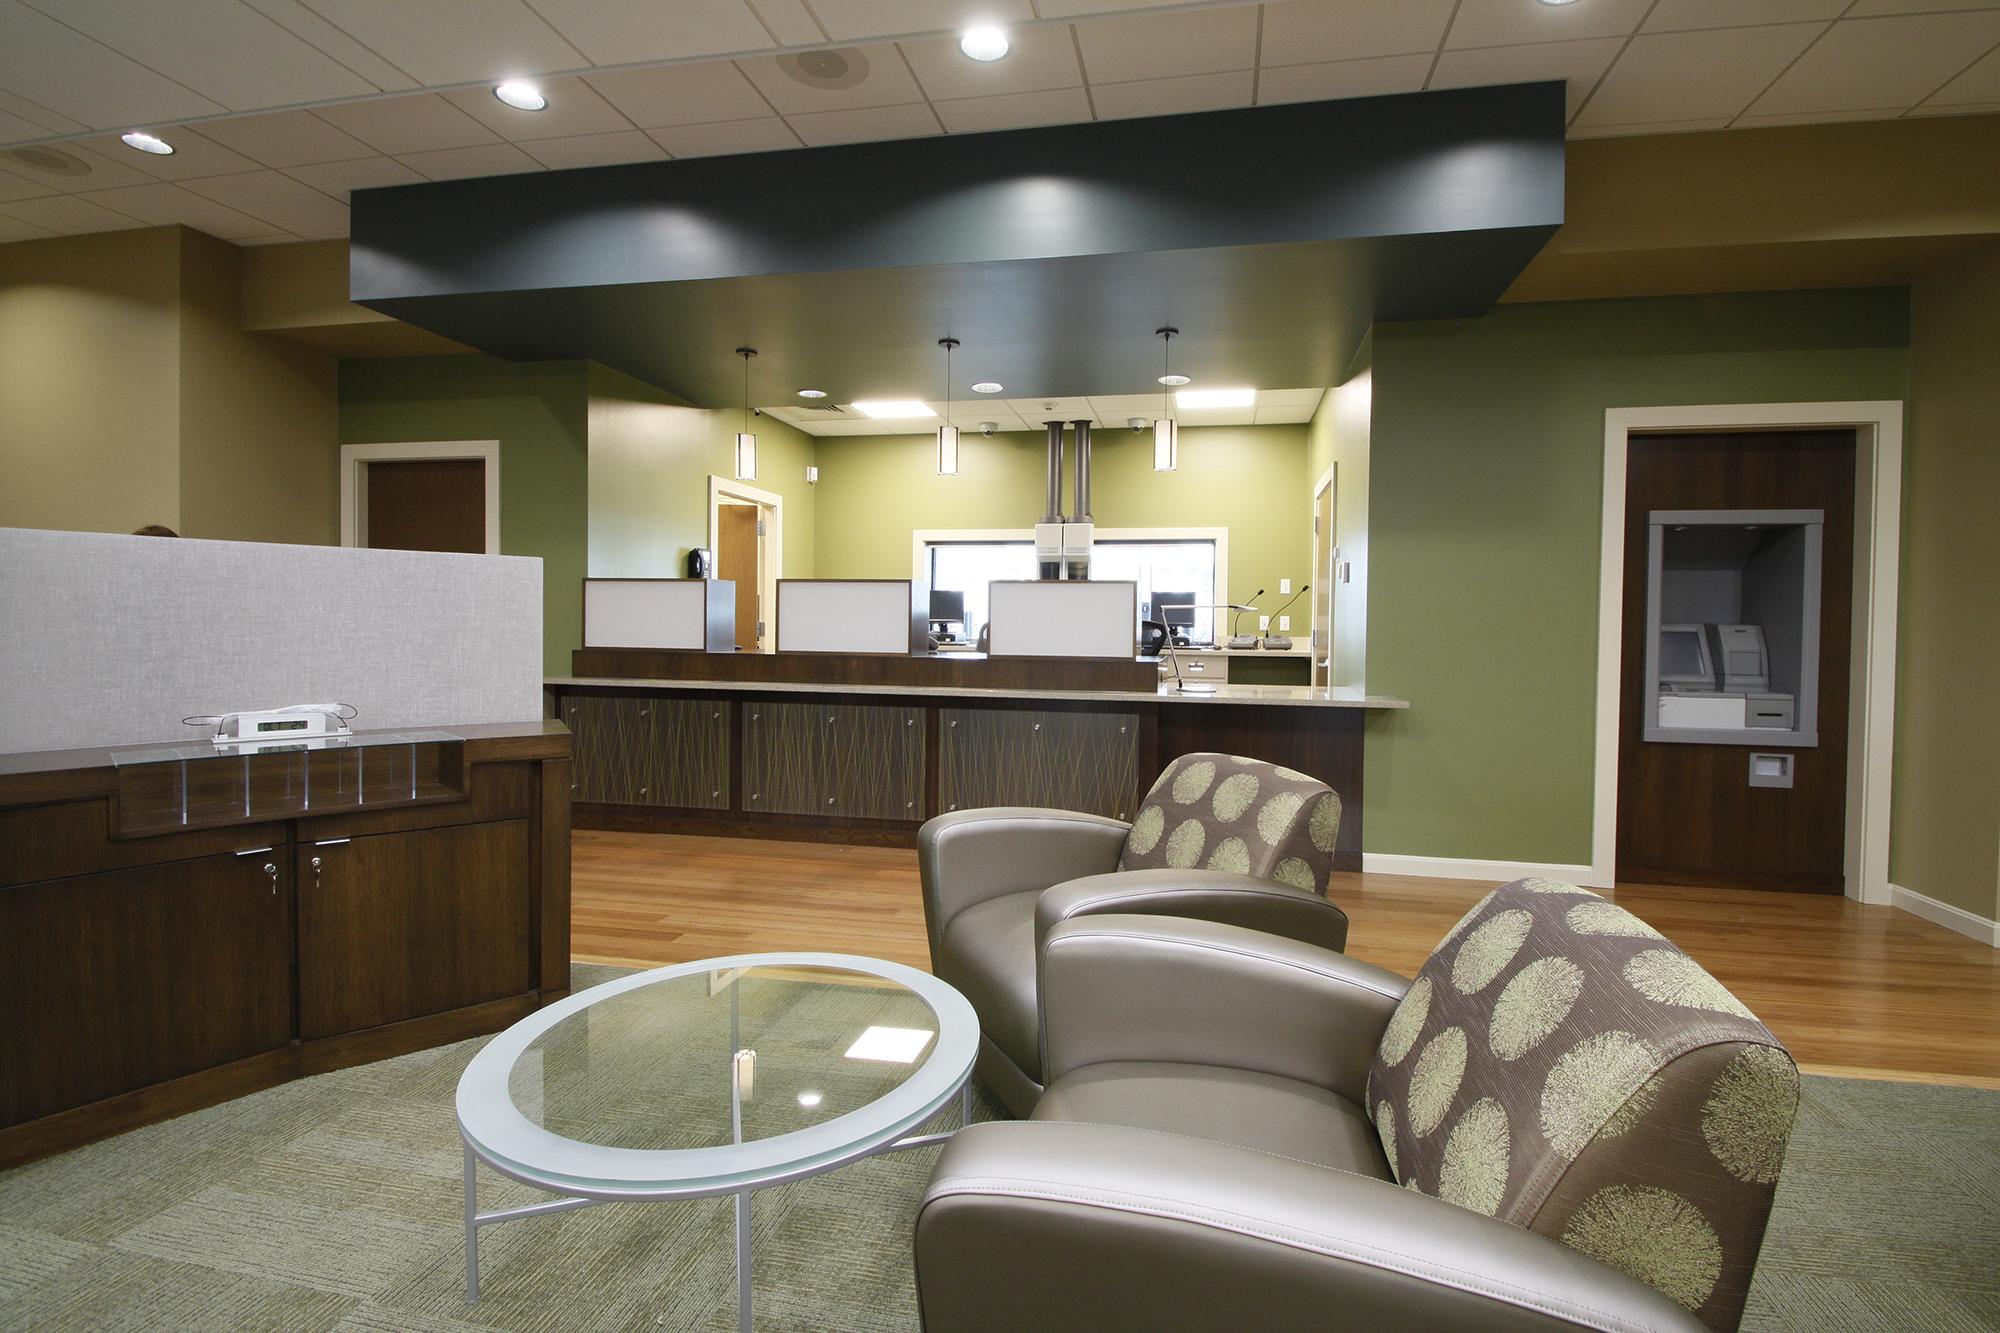 Centreville Bank - 4.JPG